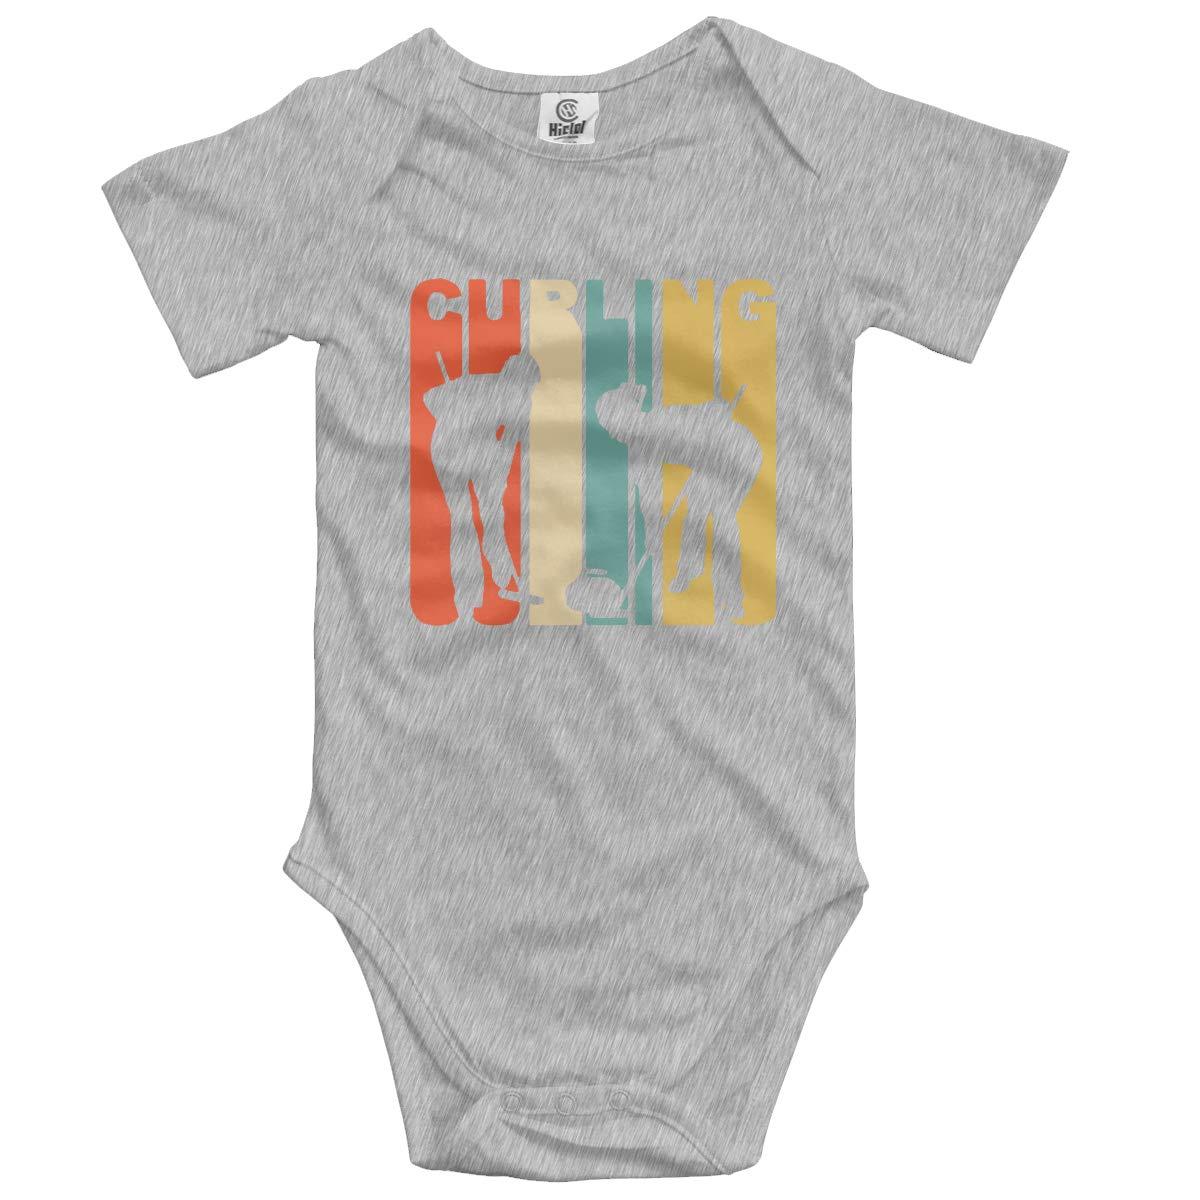 Retro 1970s Style Curlers Silhouette Curling Newborn Infant Toddler Baby Girls Boys Bodysuit Short Sleeve 0-24 MonthsBlack